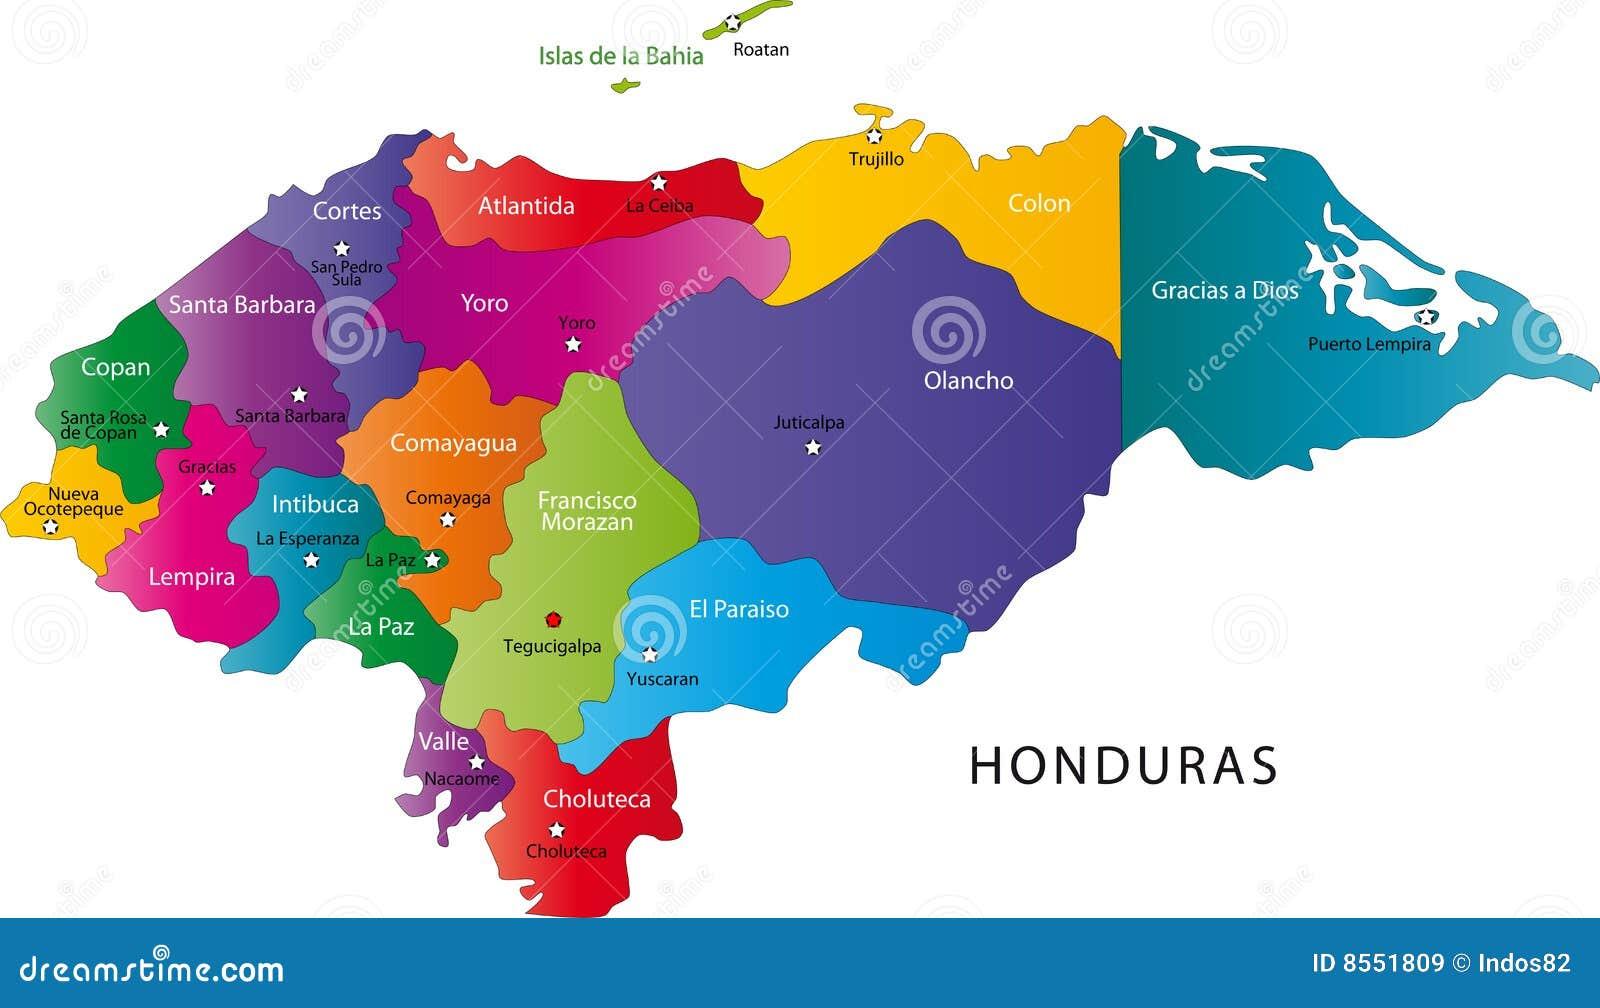 Honduras map stock vector. Illustration of departament - 8551809 on map of san bernardino county cities, map of oceania cities, map of eastern united states cities, map of s korea cities, map of kosovo cities, map of luxembourg cities, map of rio grande cities, map of palau cities, map of guyana cities, map of ohio showing cities, map of the dominican republic cities, map of western tennessee cities, map of laos cities, map of niger cities, map of mississippi river cities, map of democratic republic of congo cities, map equatorial guinea cities, map of guam cities, map of gulf of california cities, map of burundi cities,